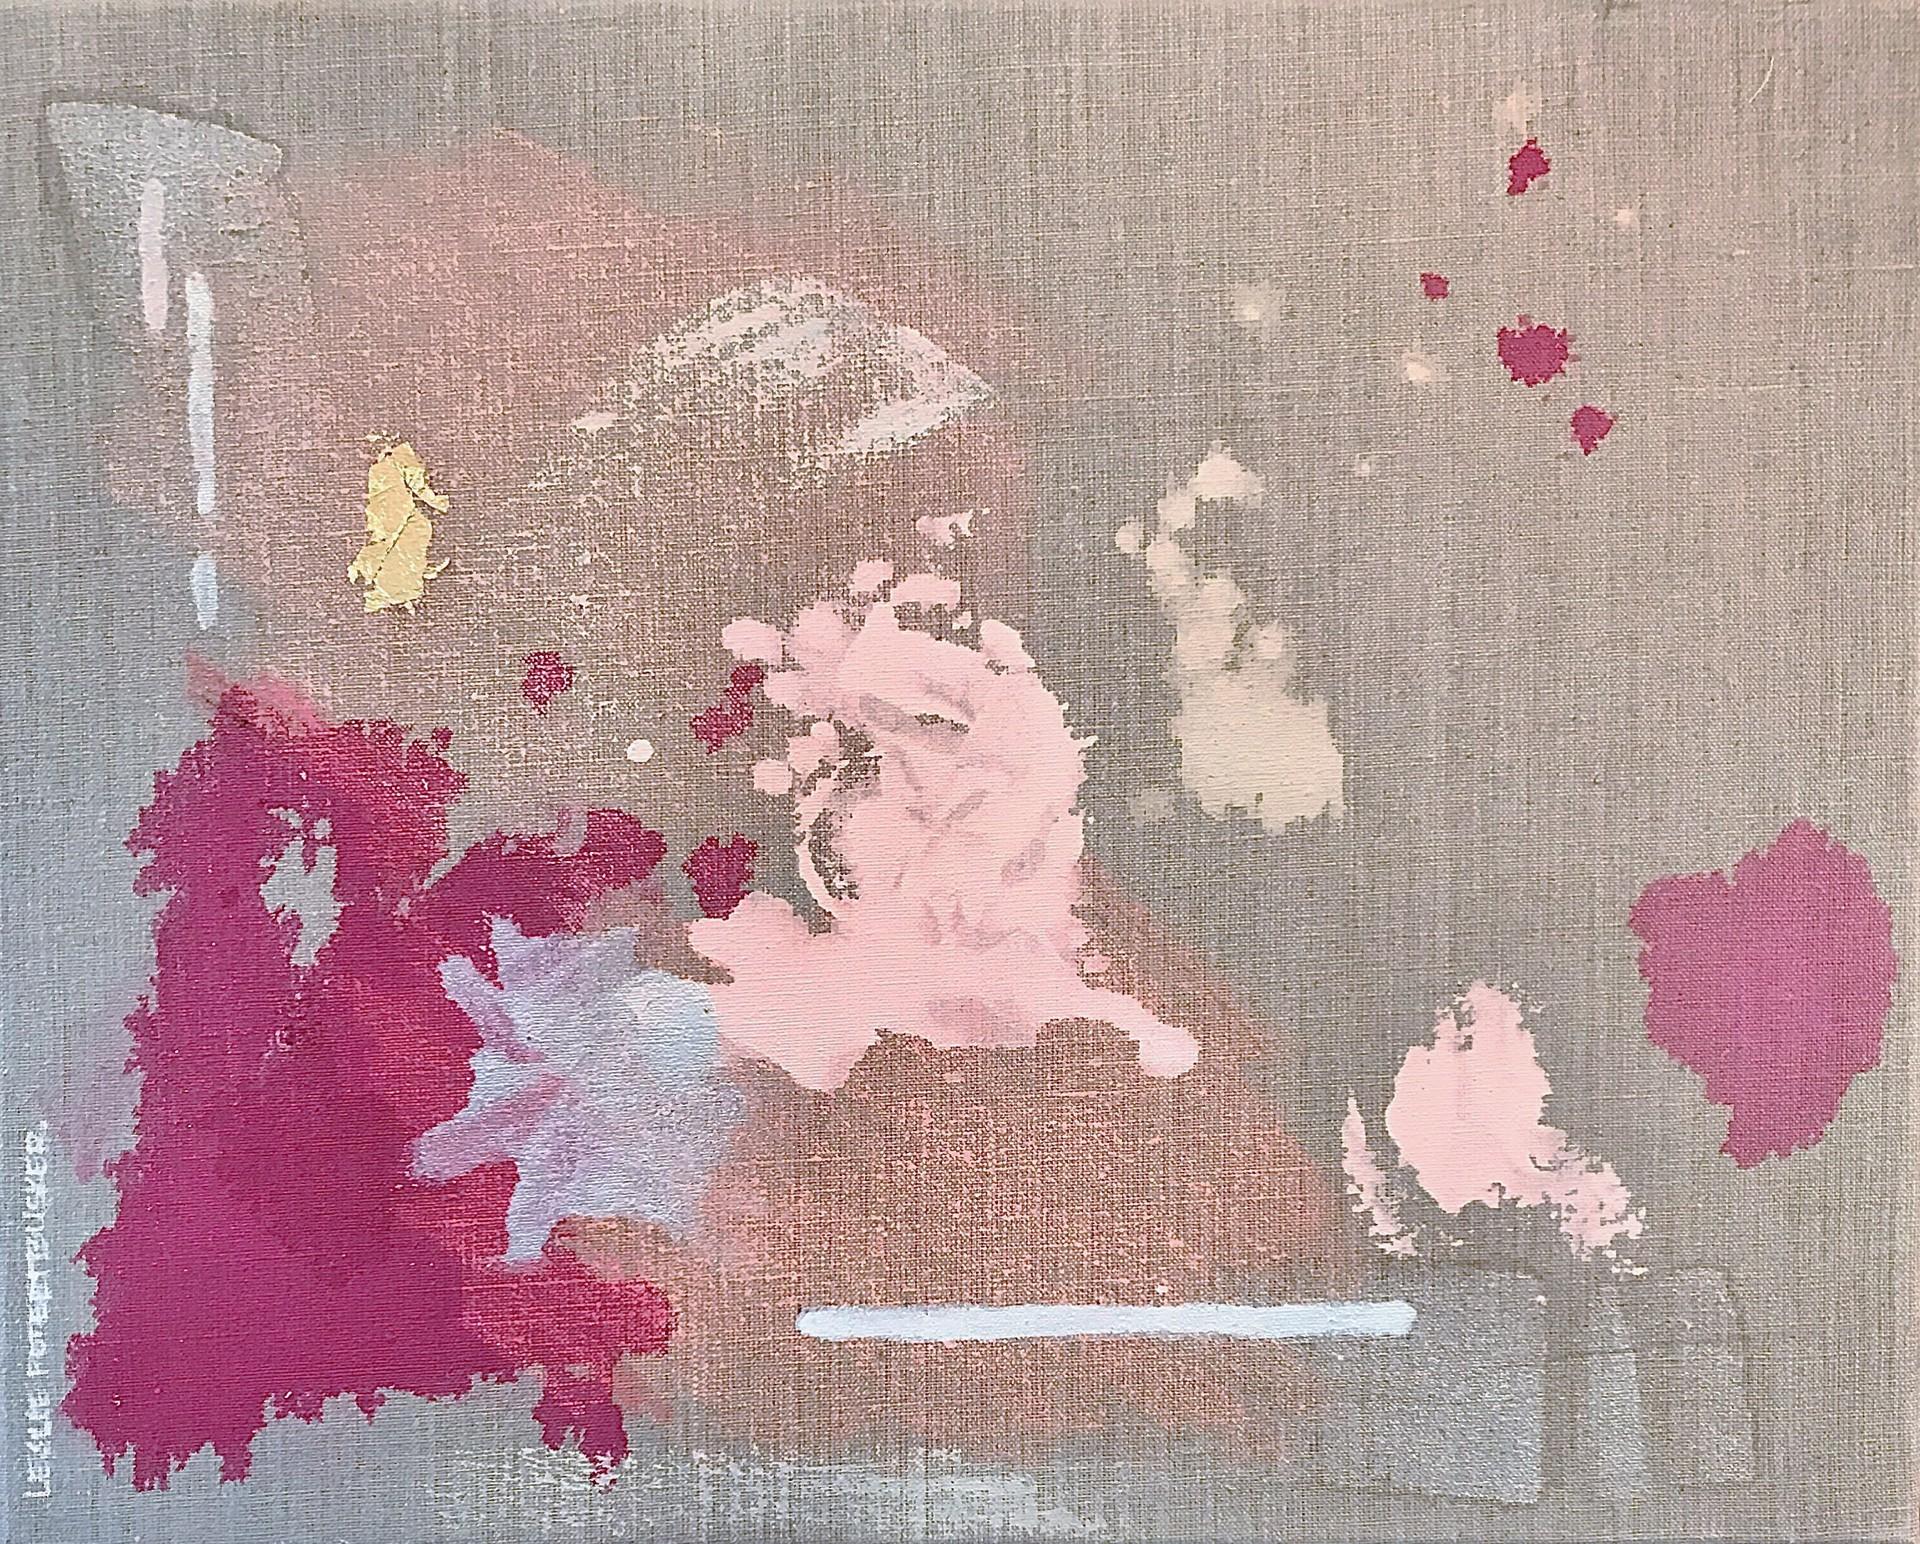 Rose Fairy Princess by Leslie Poteet Busker